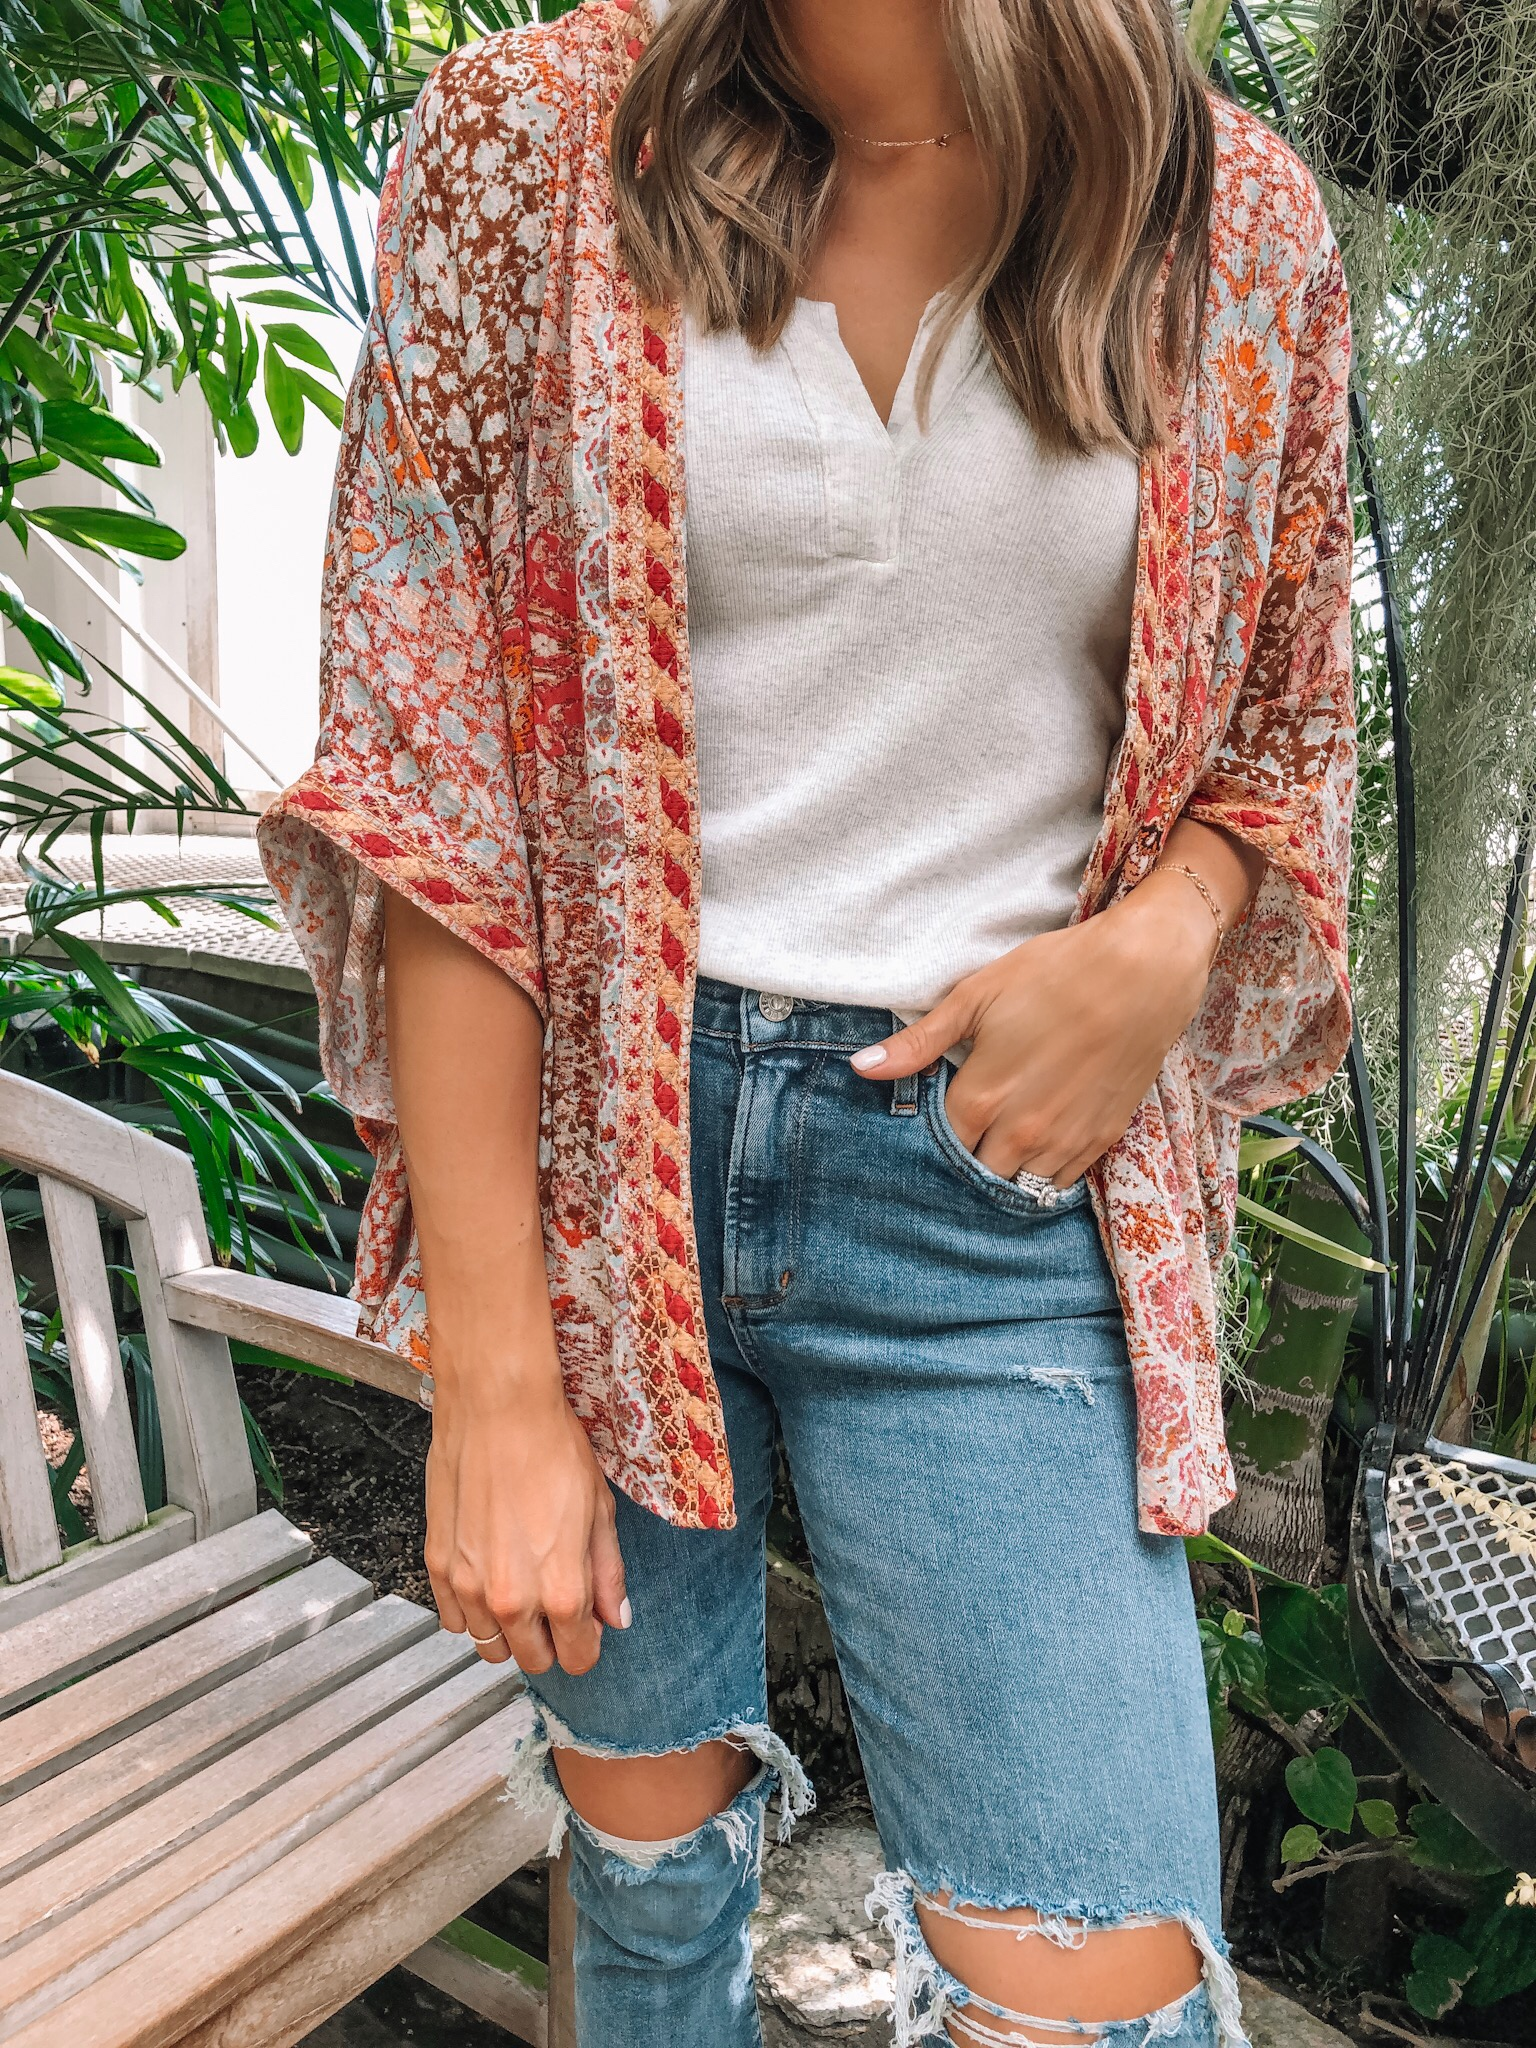 evereve Mother's Day sale 2019, Allison joy mosaic kimono, bobi rib tank, agolde Sophie crop